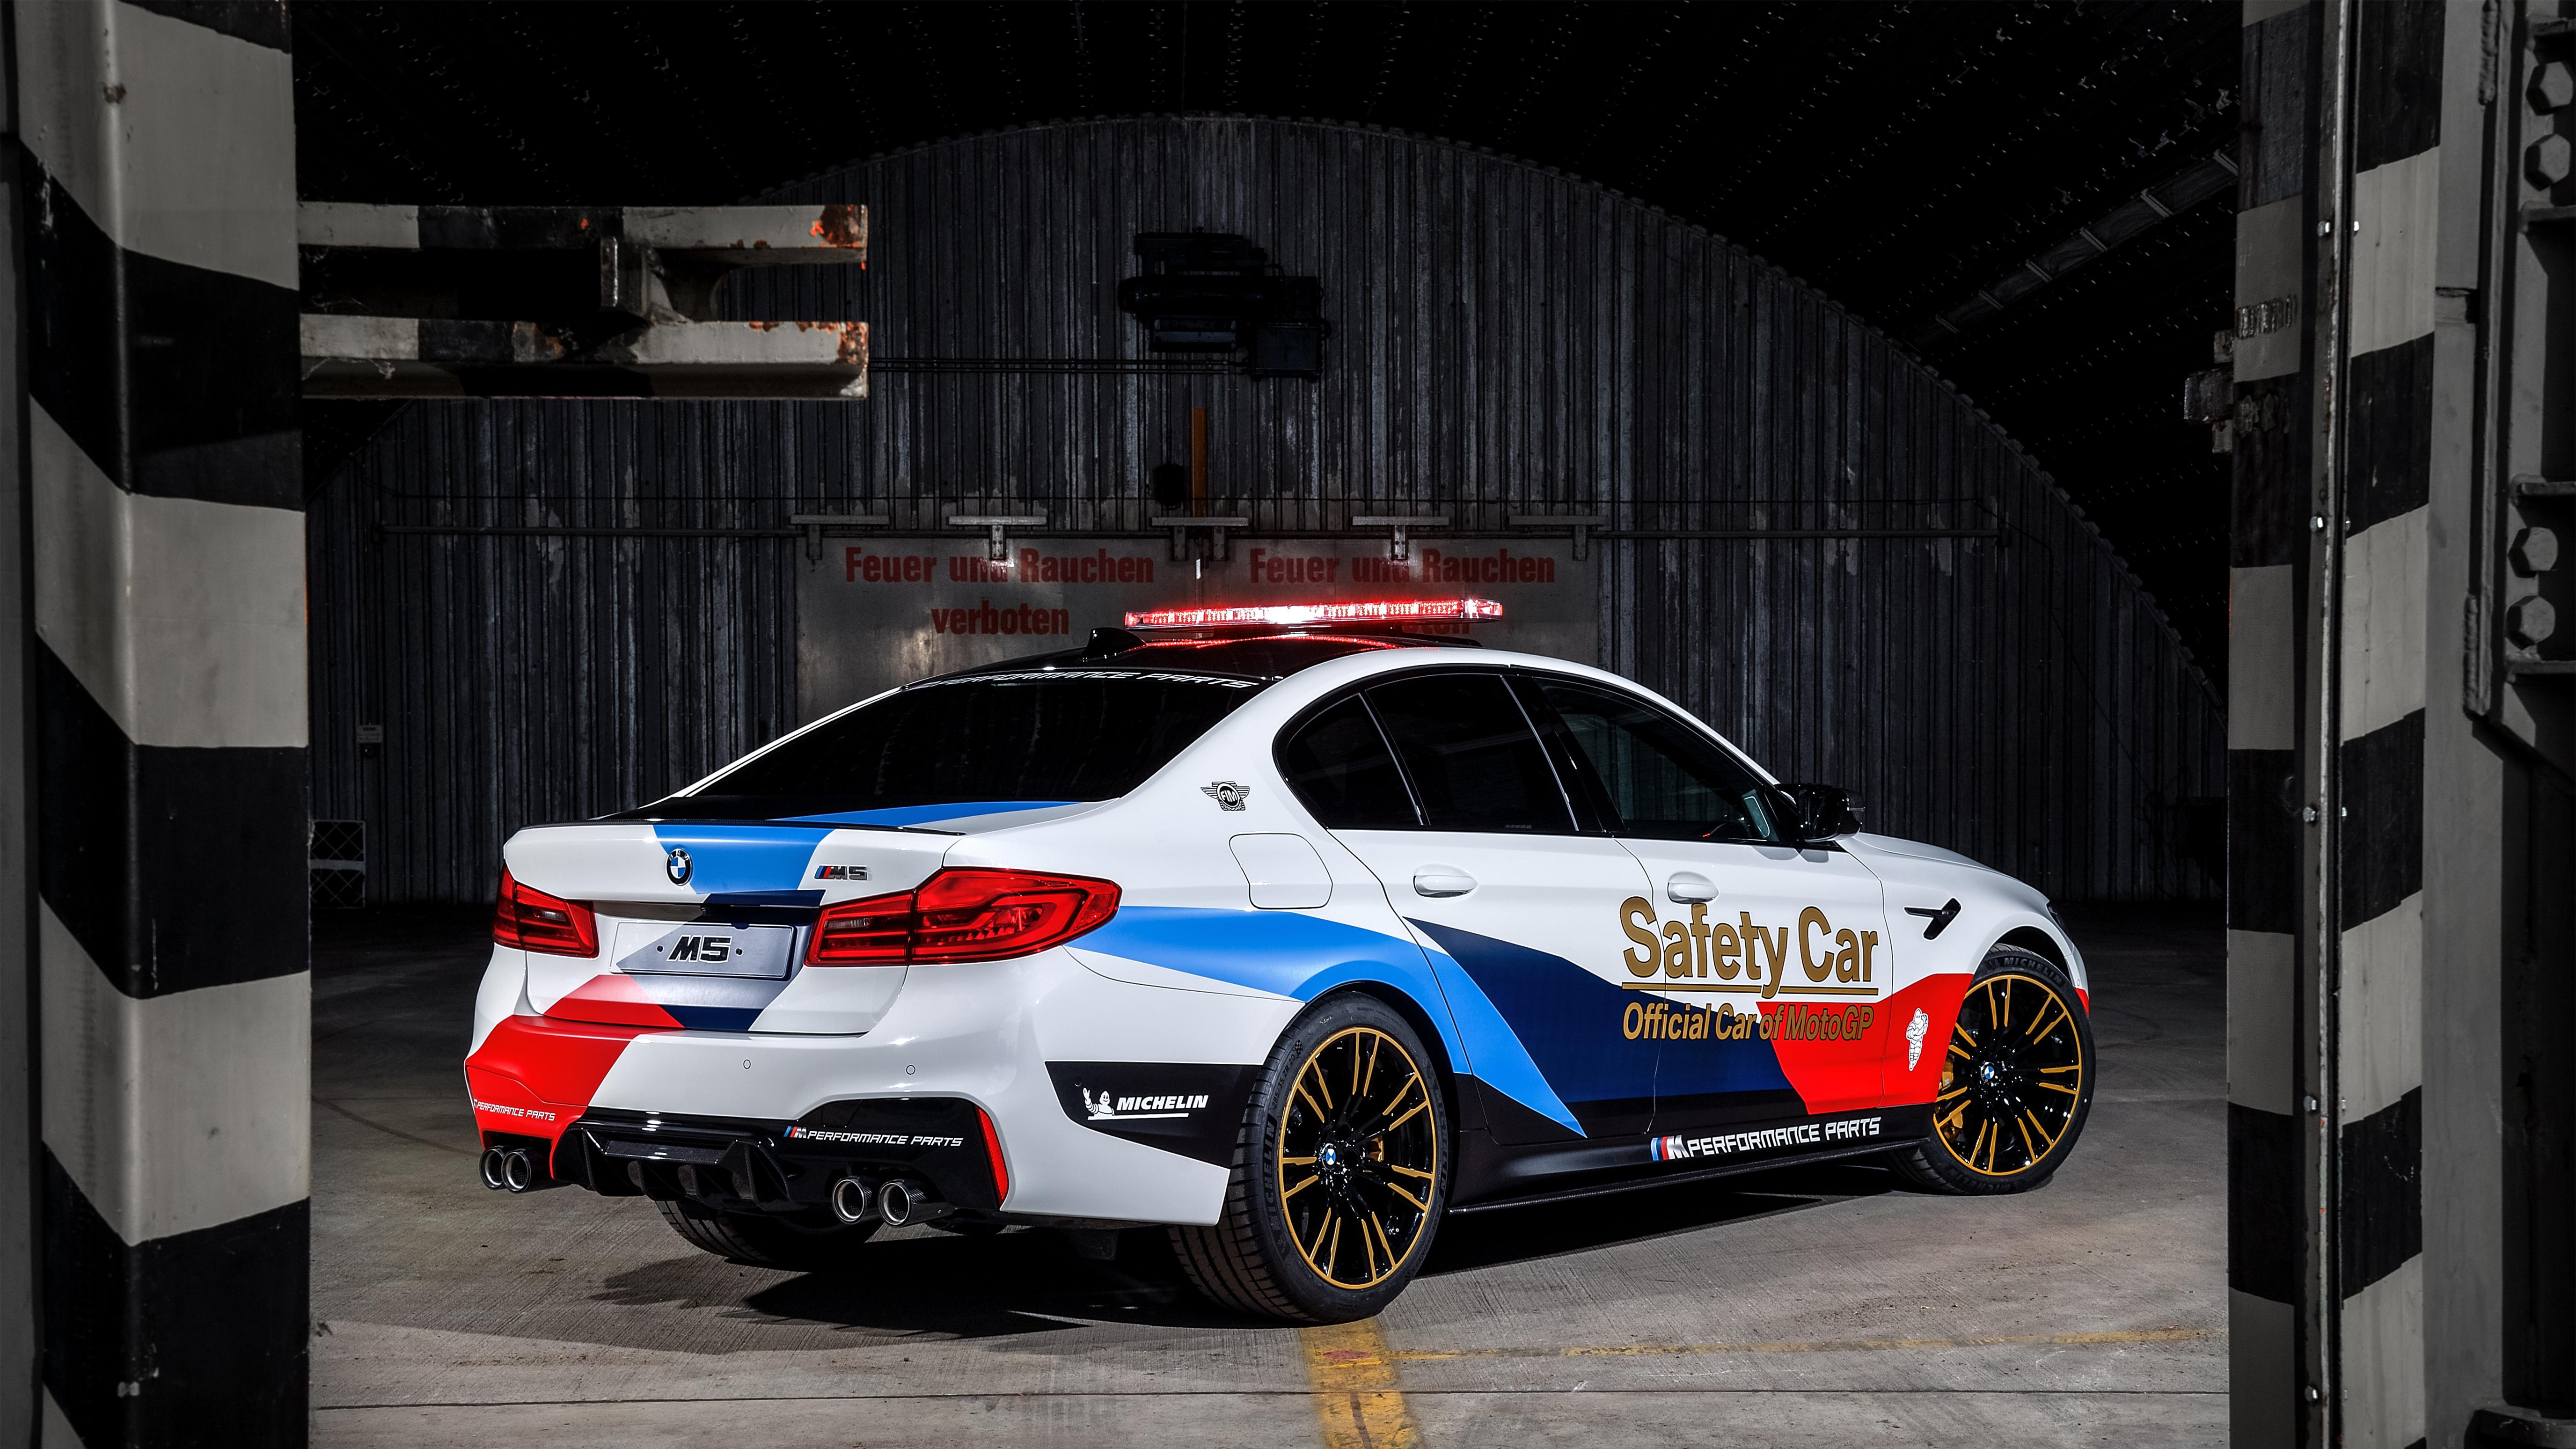 2018 Bmw M5 Motogp Safety Car 4k Ultra Hd Wallpaper Background Image 5504x3096